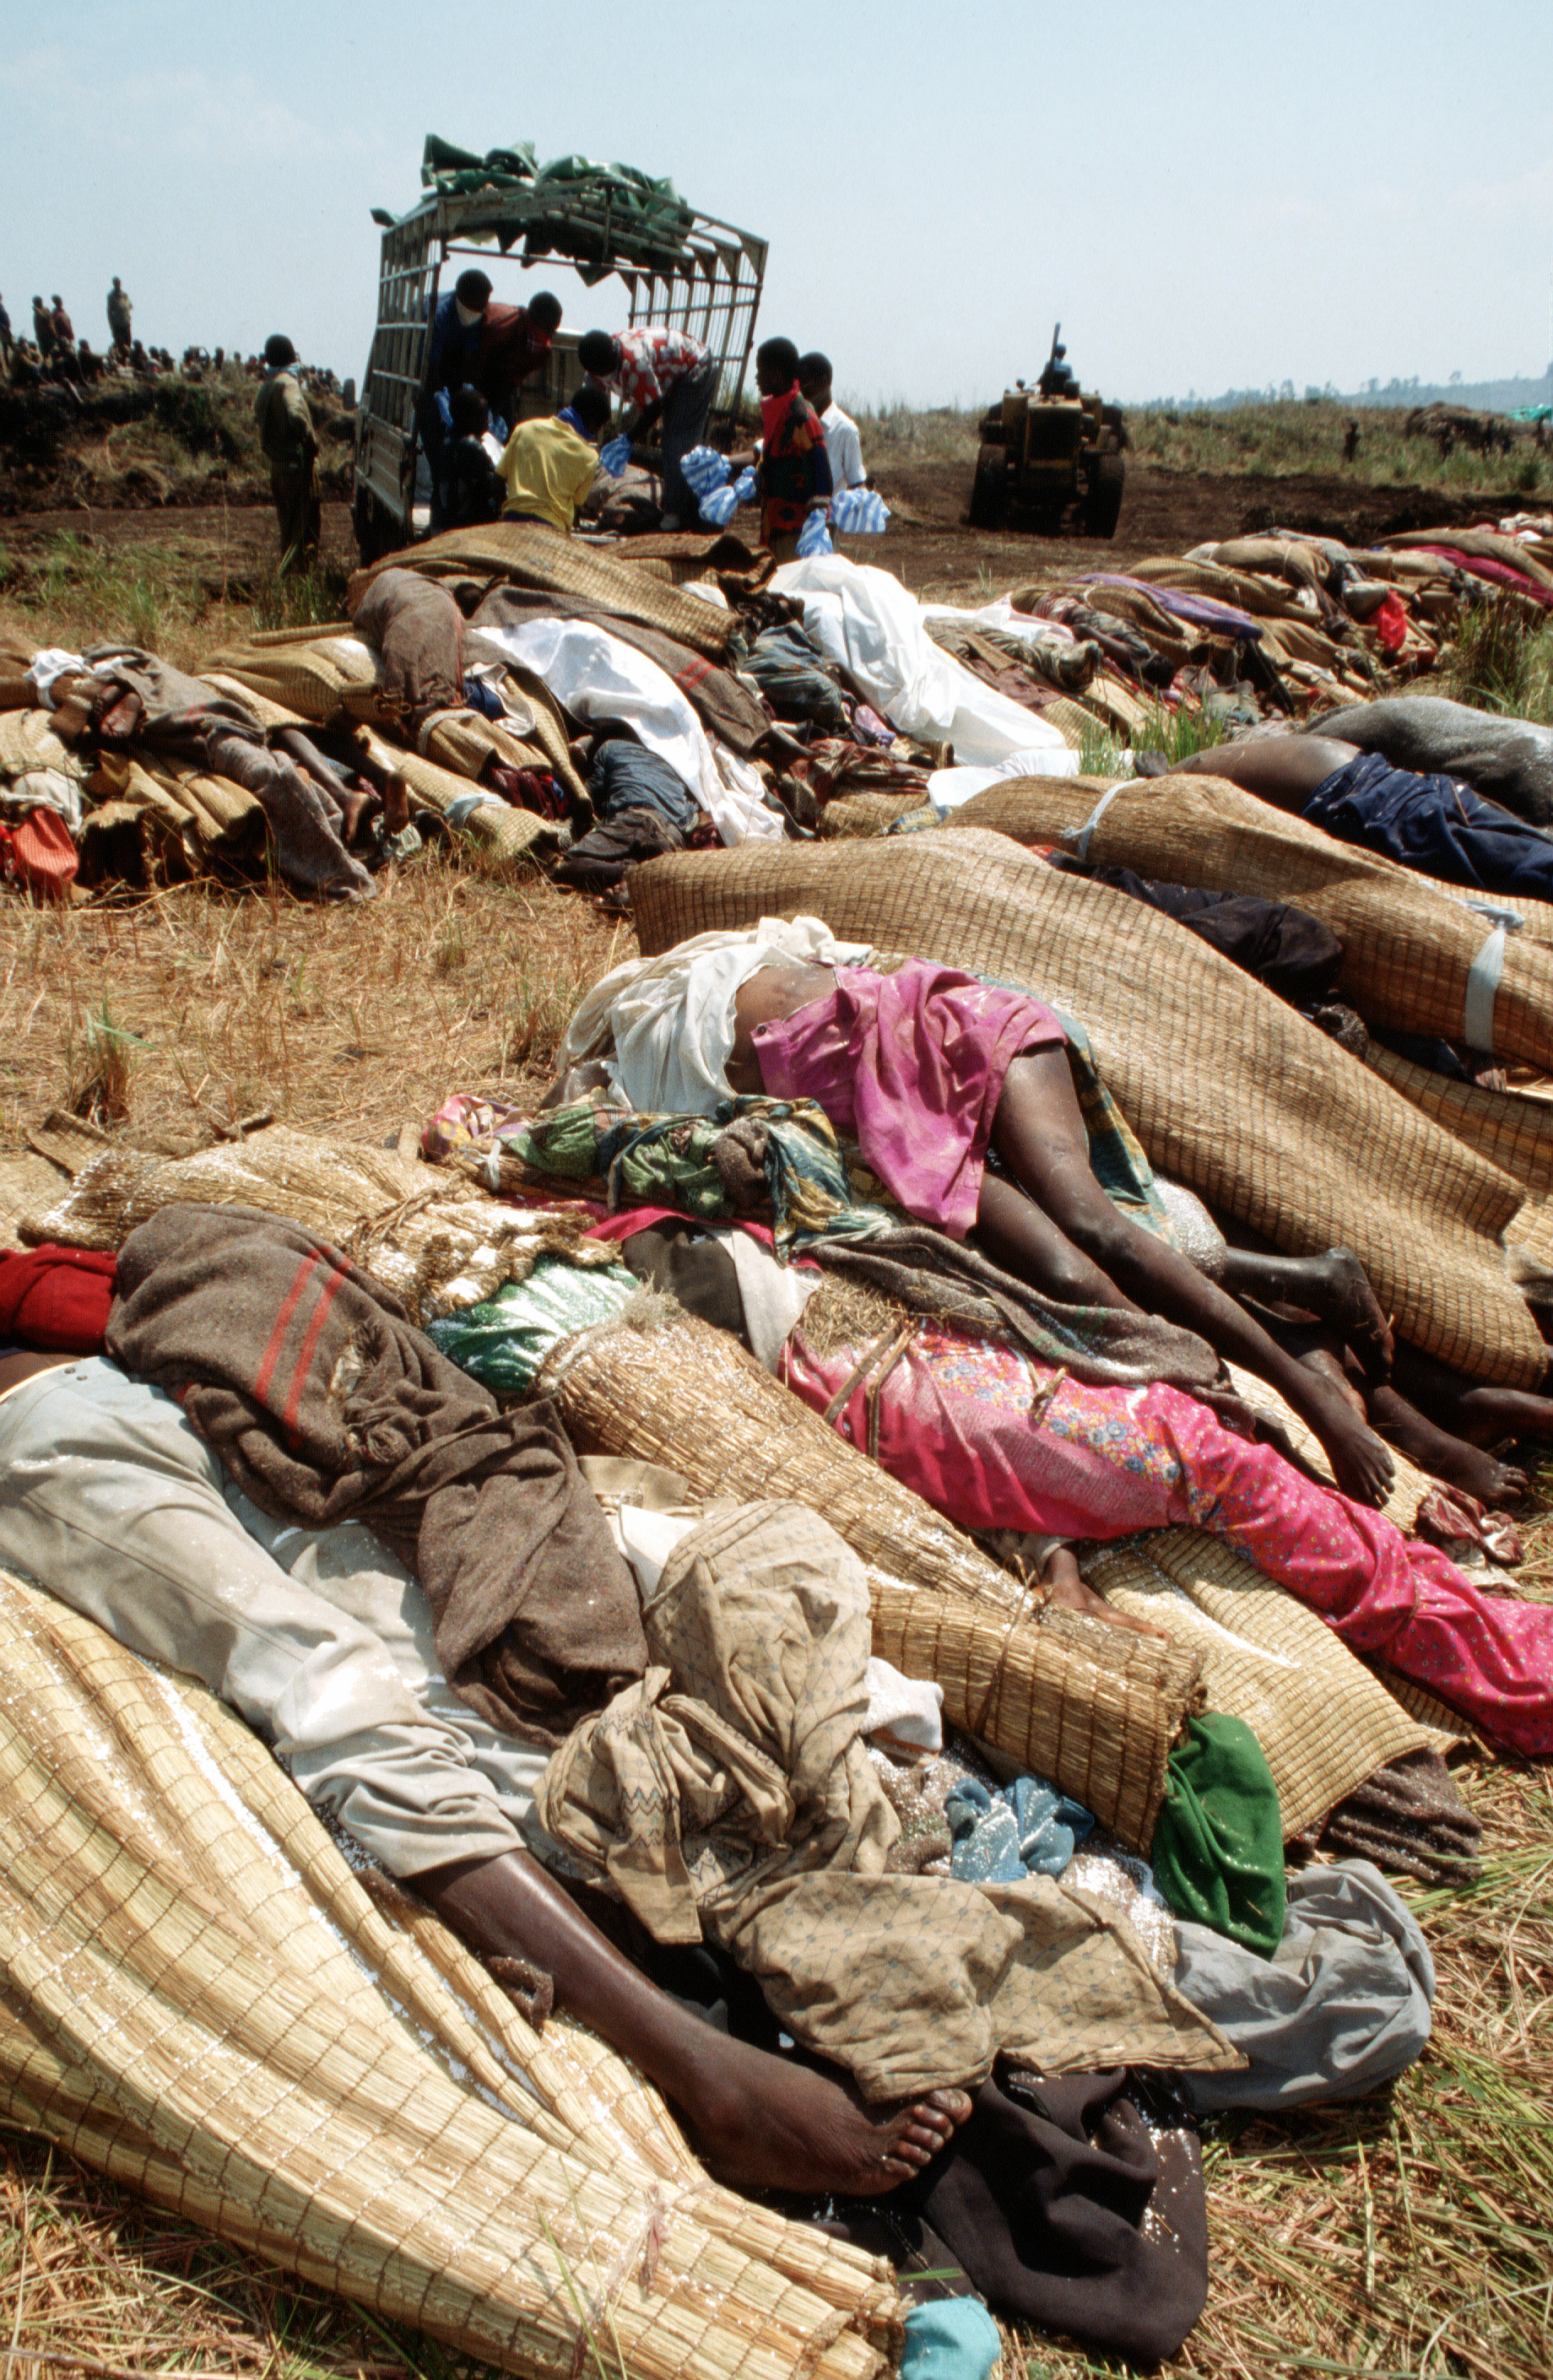 File:Bodies of Rwandan refugees DF-ST-02-03035.jpg - Wikipedia